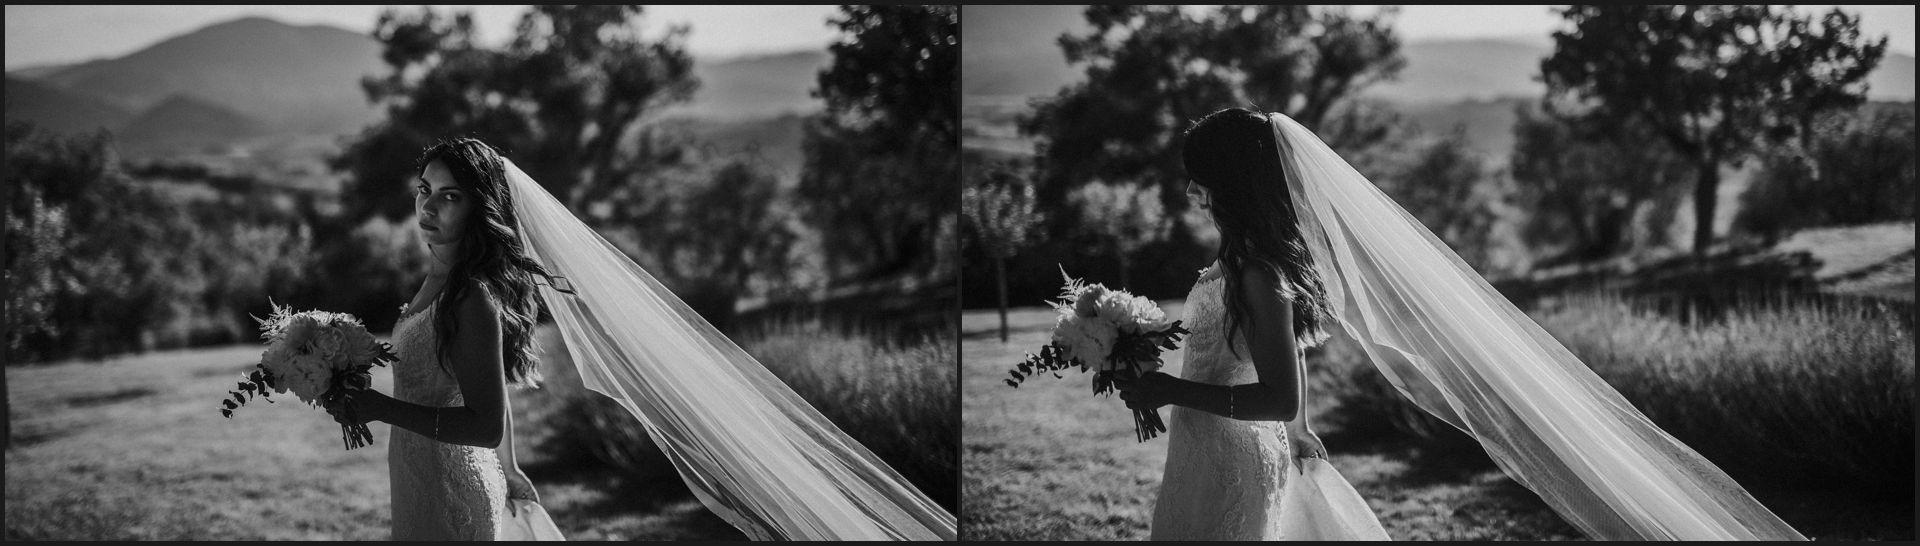 black and white, wedding, umbria, nikis resort, bride, veil, dramatic, alternative